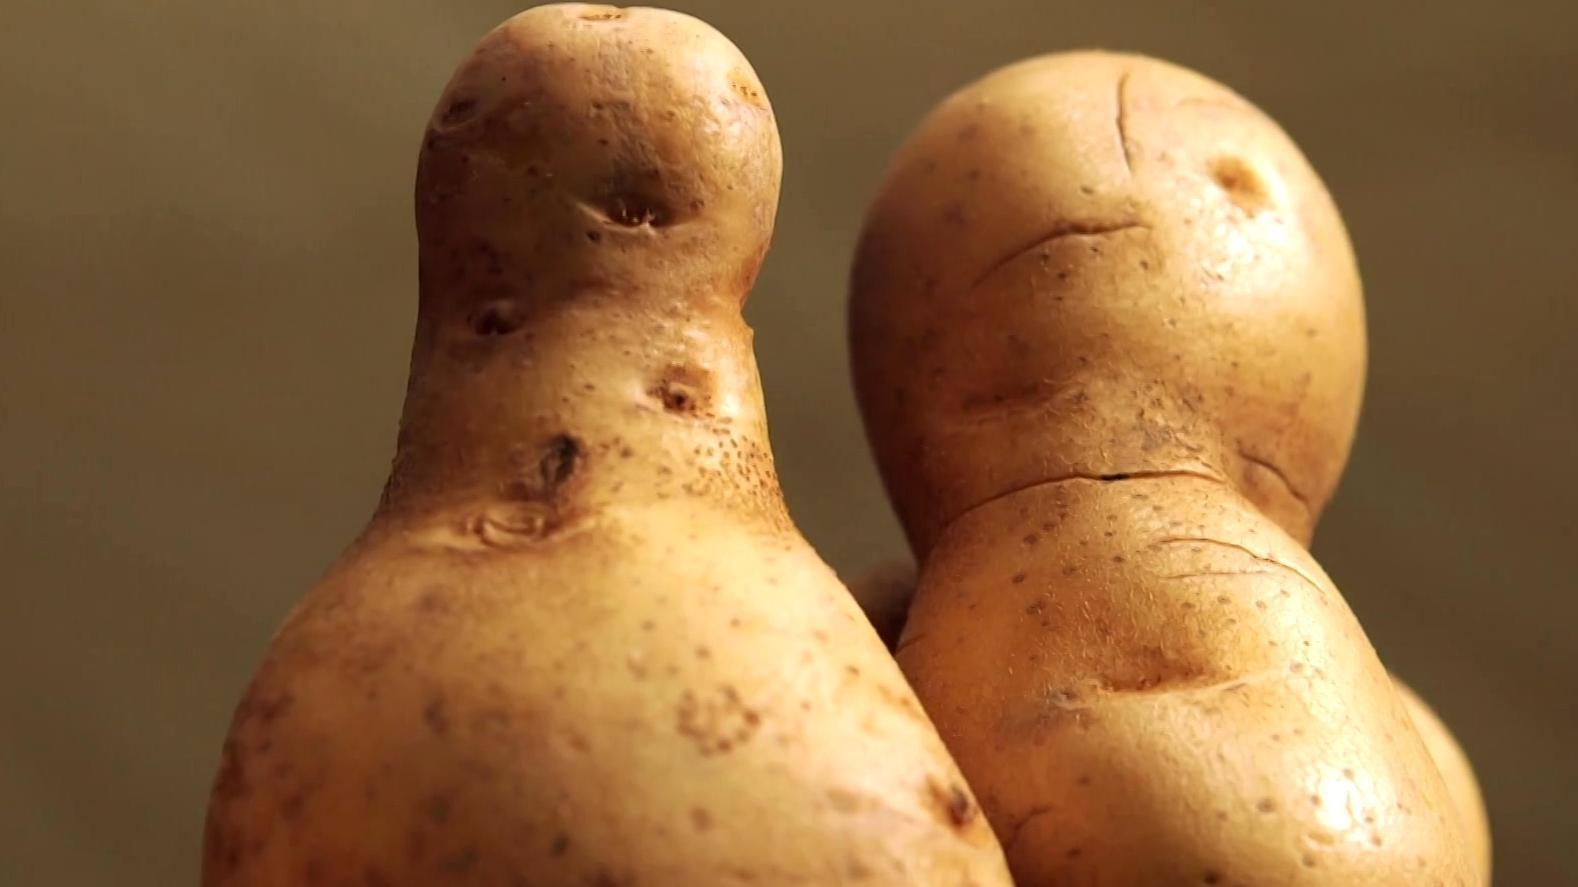 Krumme Kartoffeln